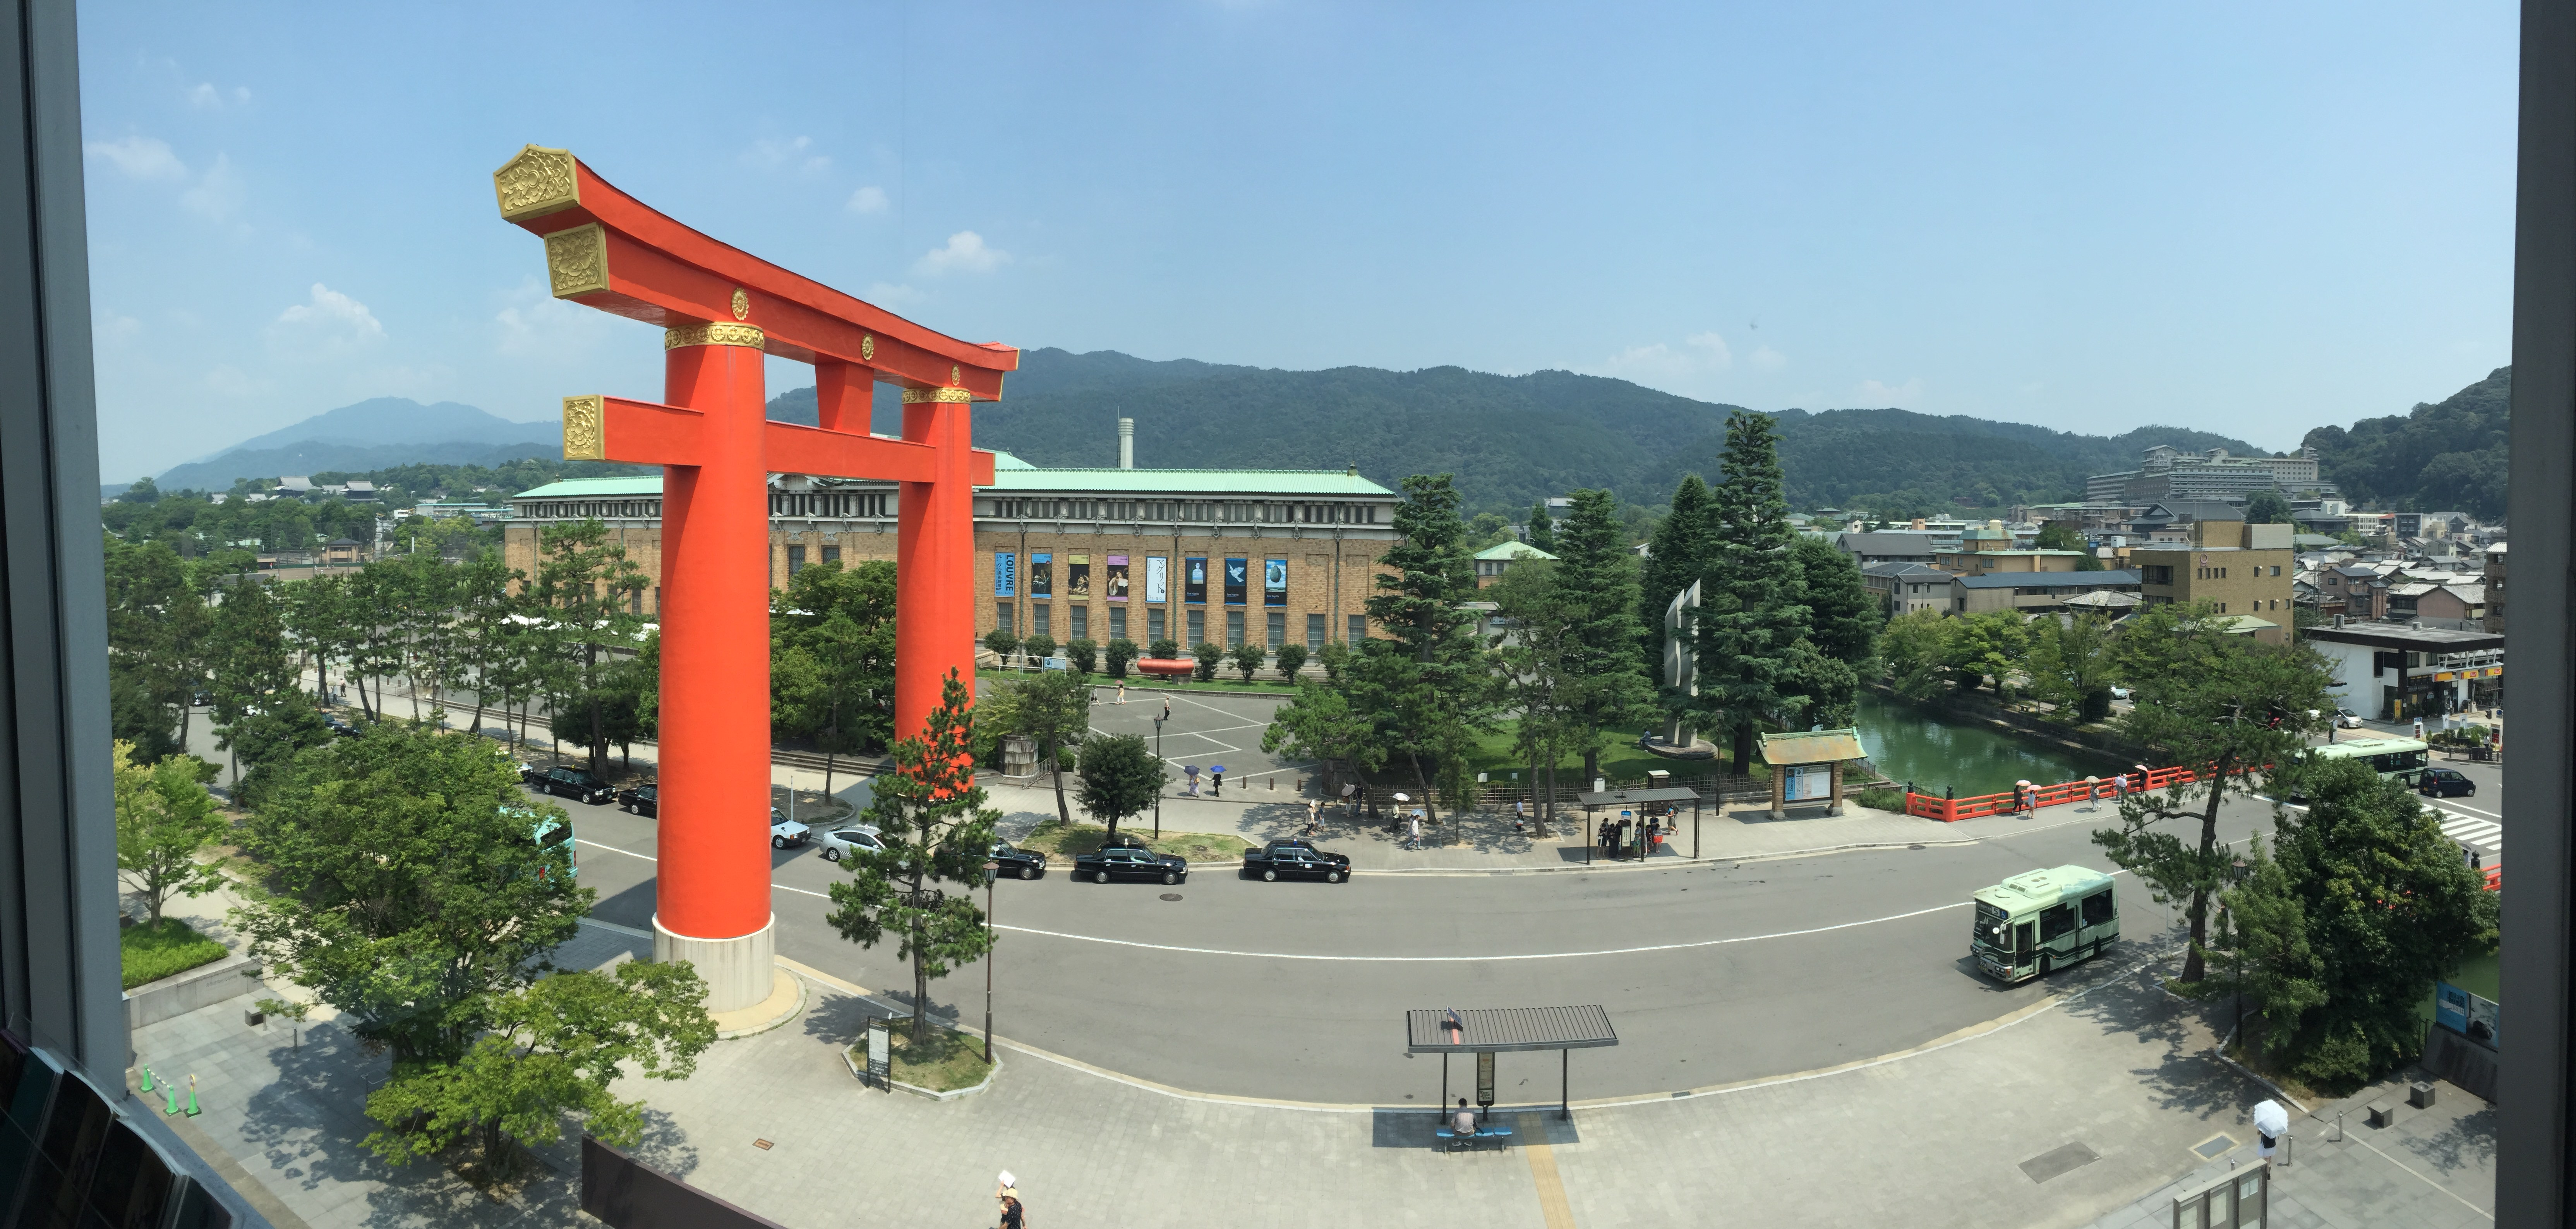 Tour de Fail – Kyoto  Nice Places To Sit And Read